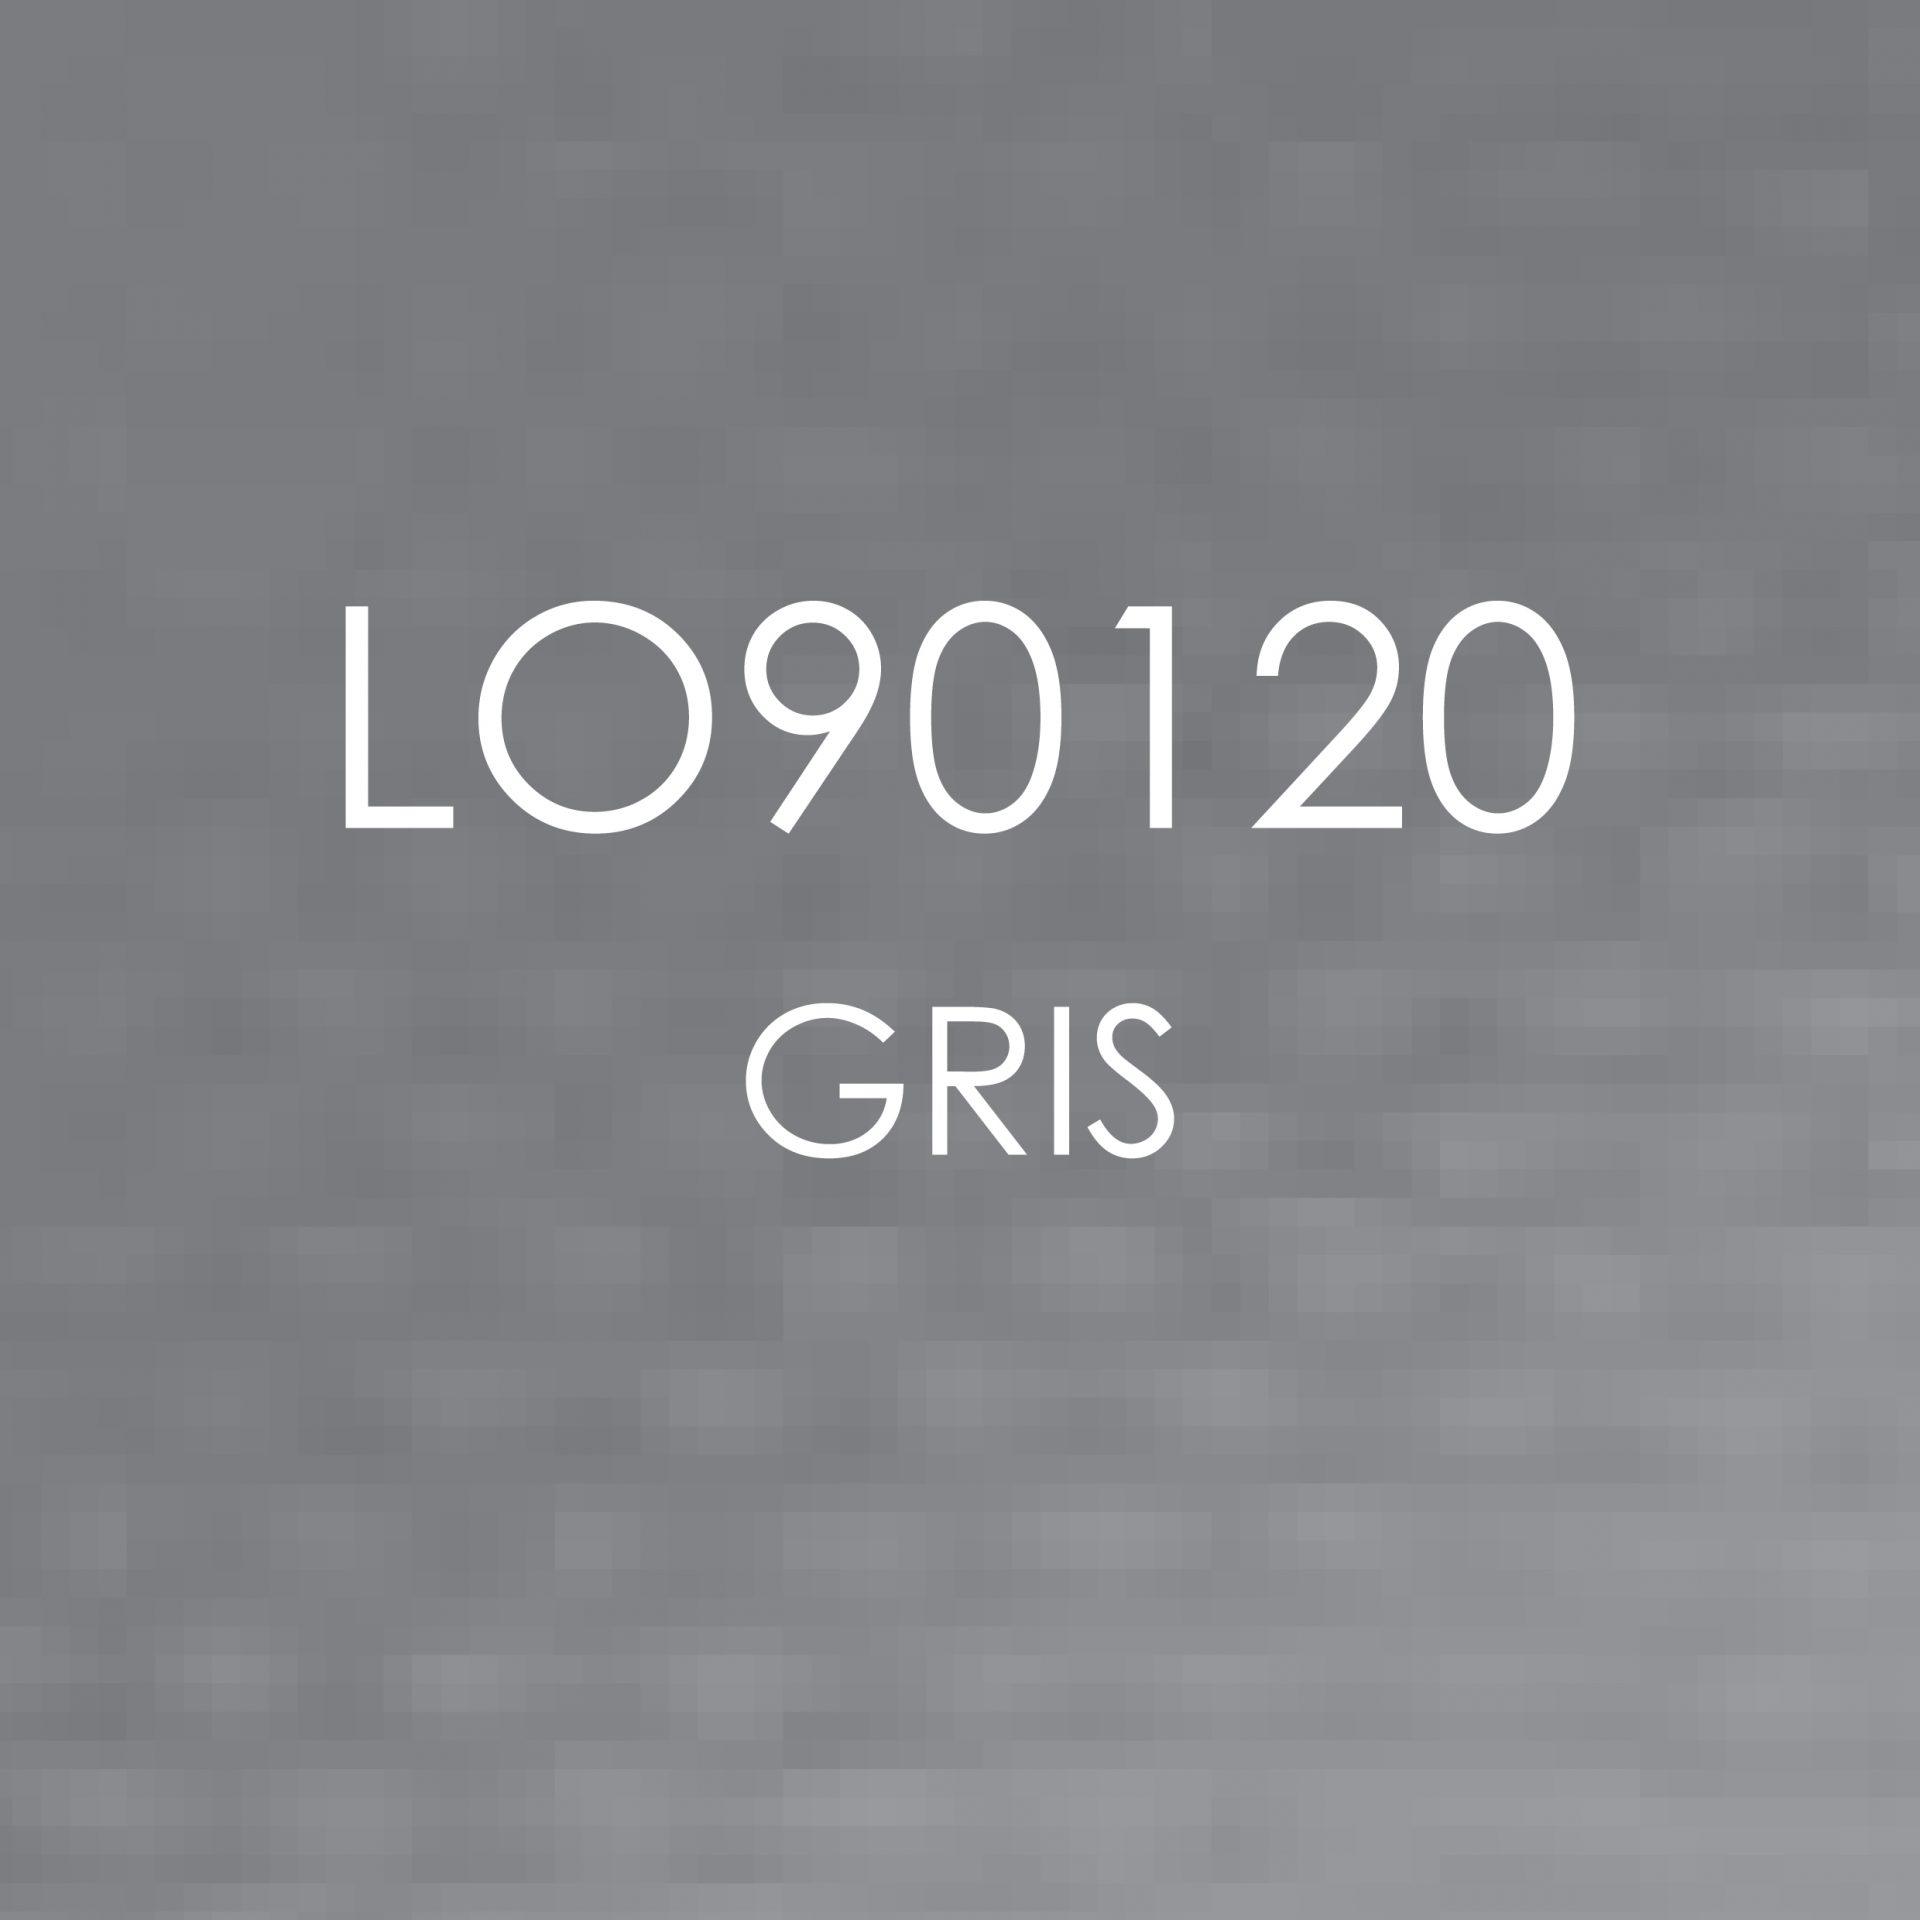 LO90120